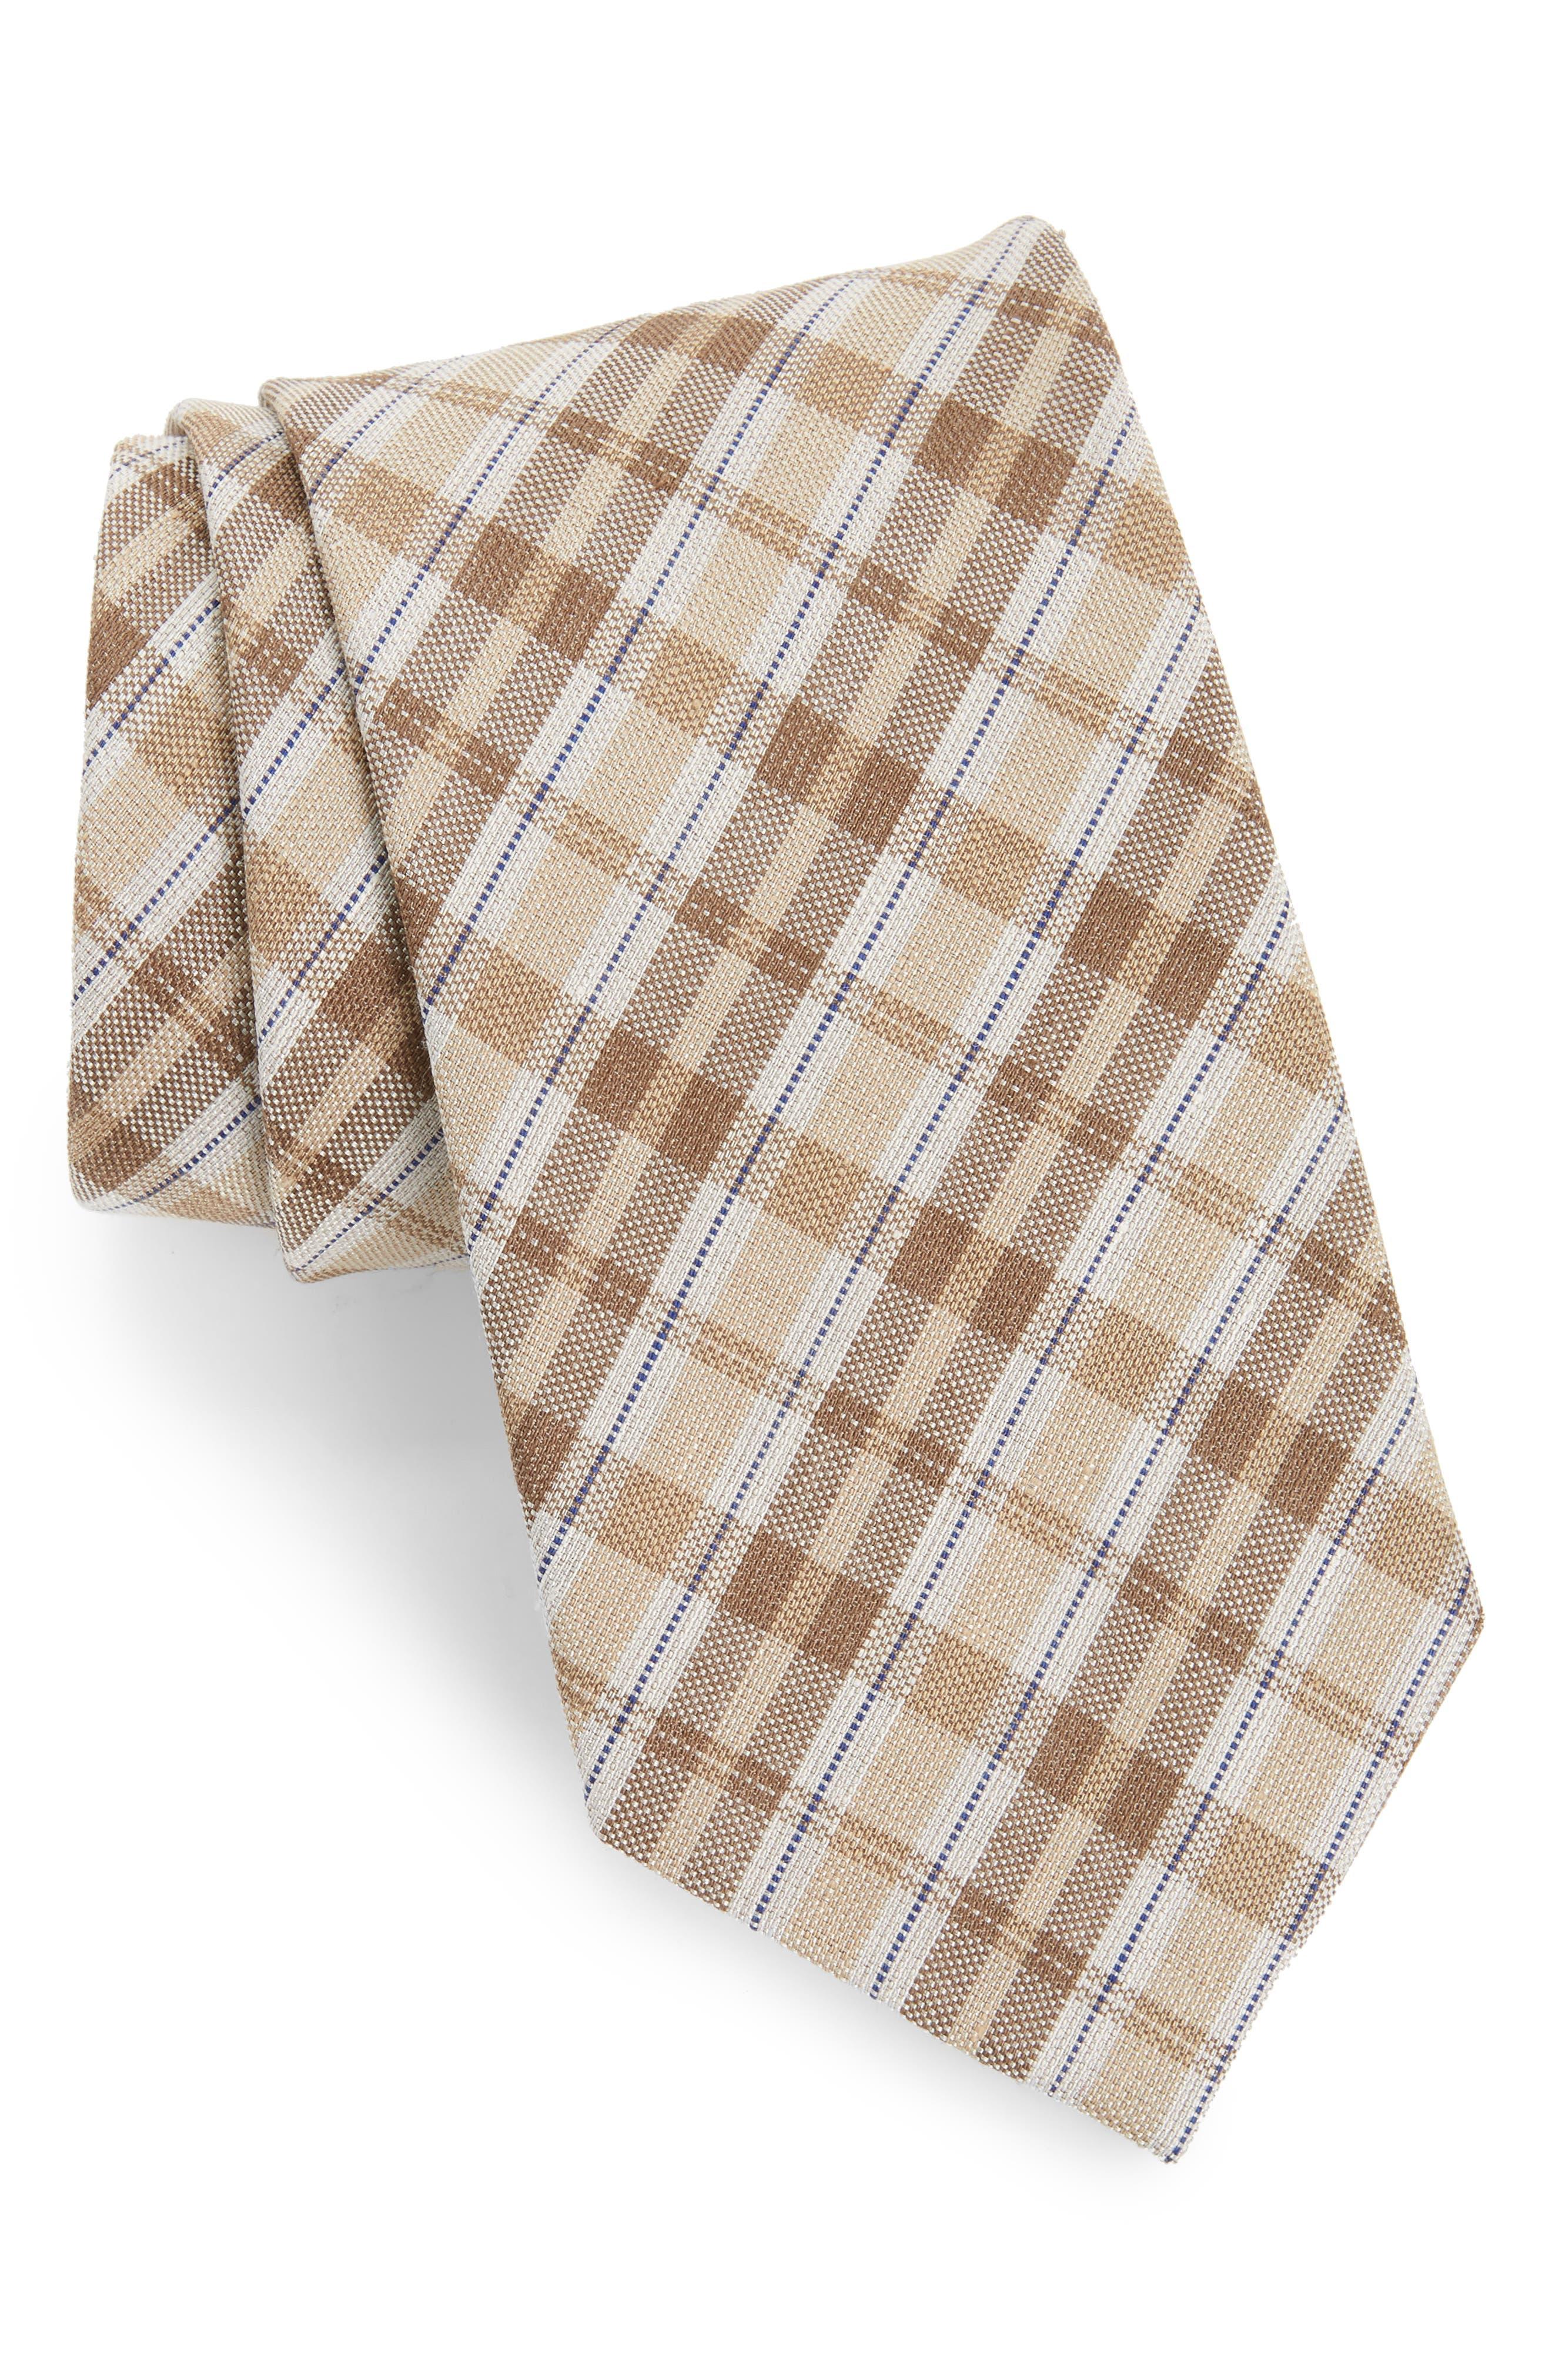 DAVID DONAHUE,                             Plaid Linen & Silk Tie,                             Main thumbnail 1, color,                             294